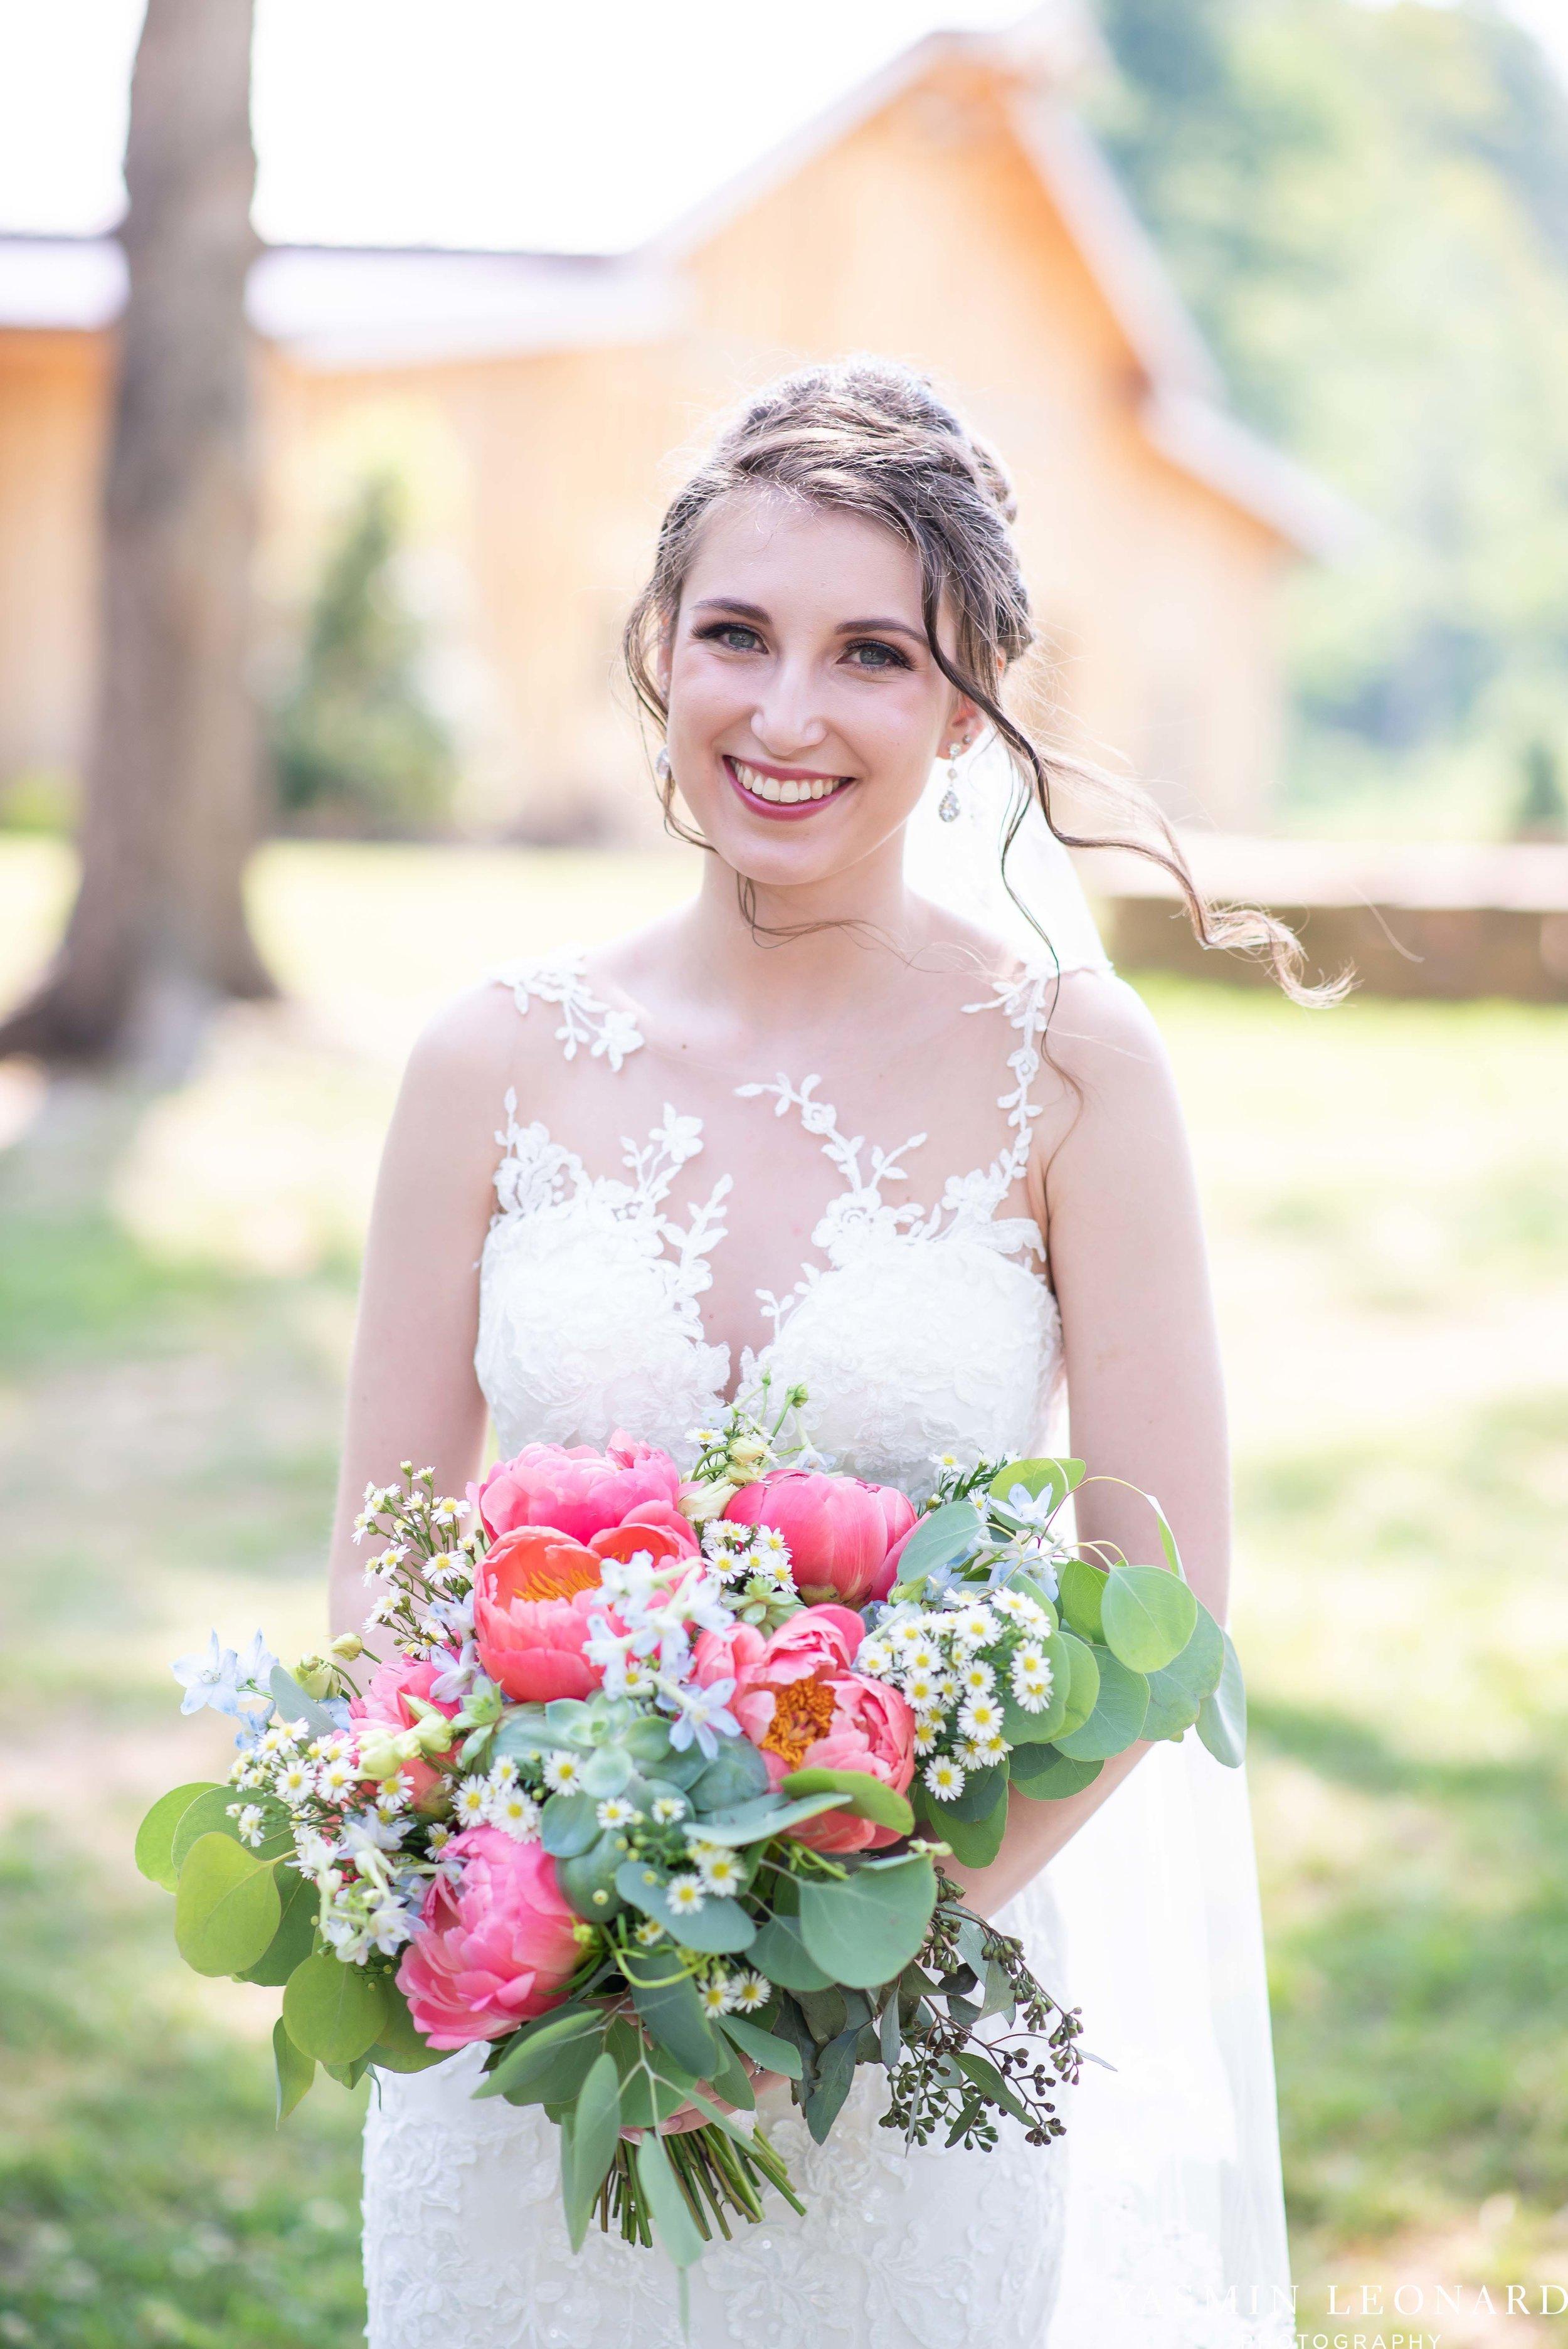 Old Homeplace Vineyard - NC Weddings - Outdoor Summer Weddings - Peony Boutique - Vineyard Wedding - NC Photographer - Yasmin Leonard Photography-10.jpg